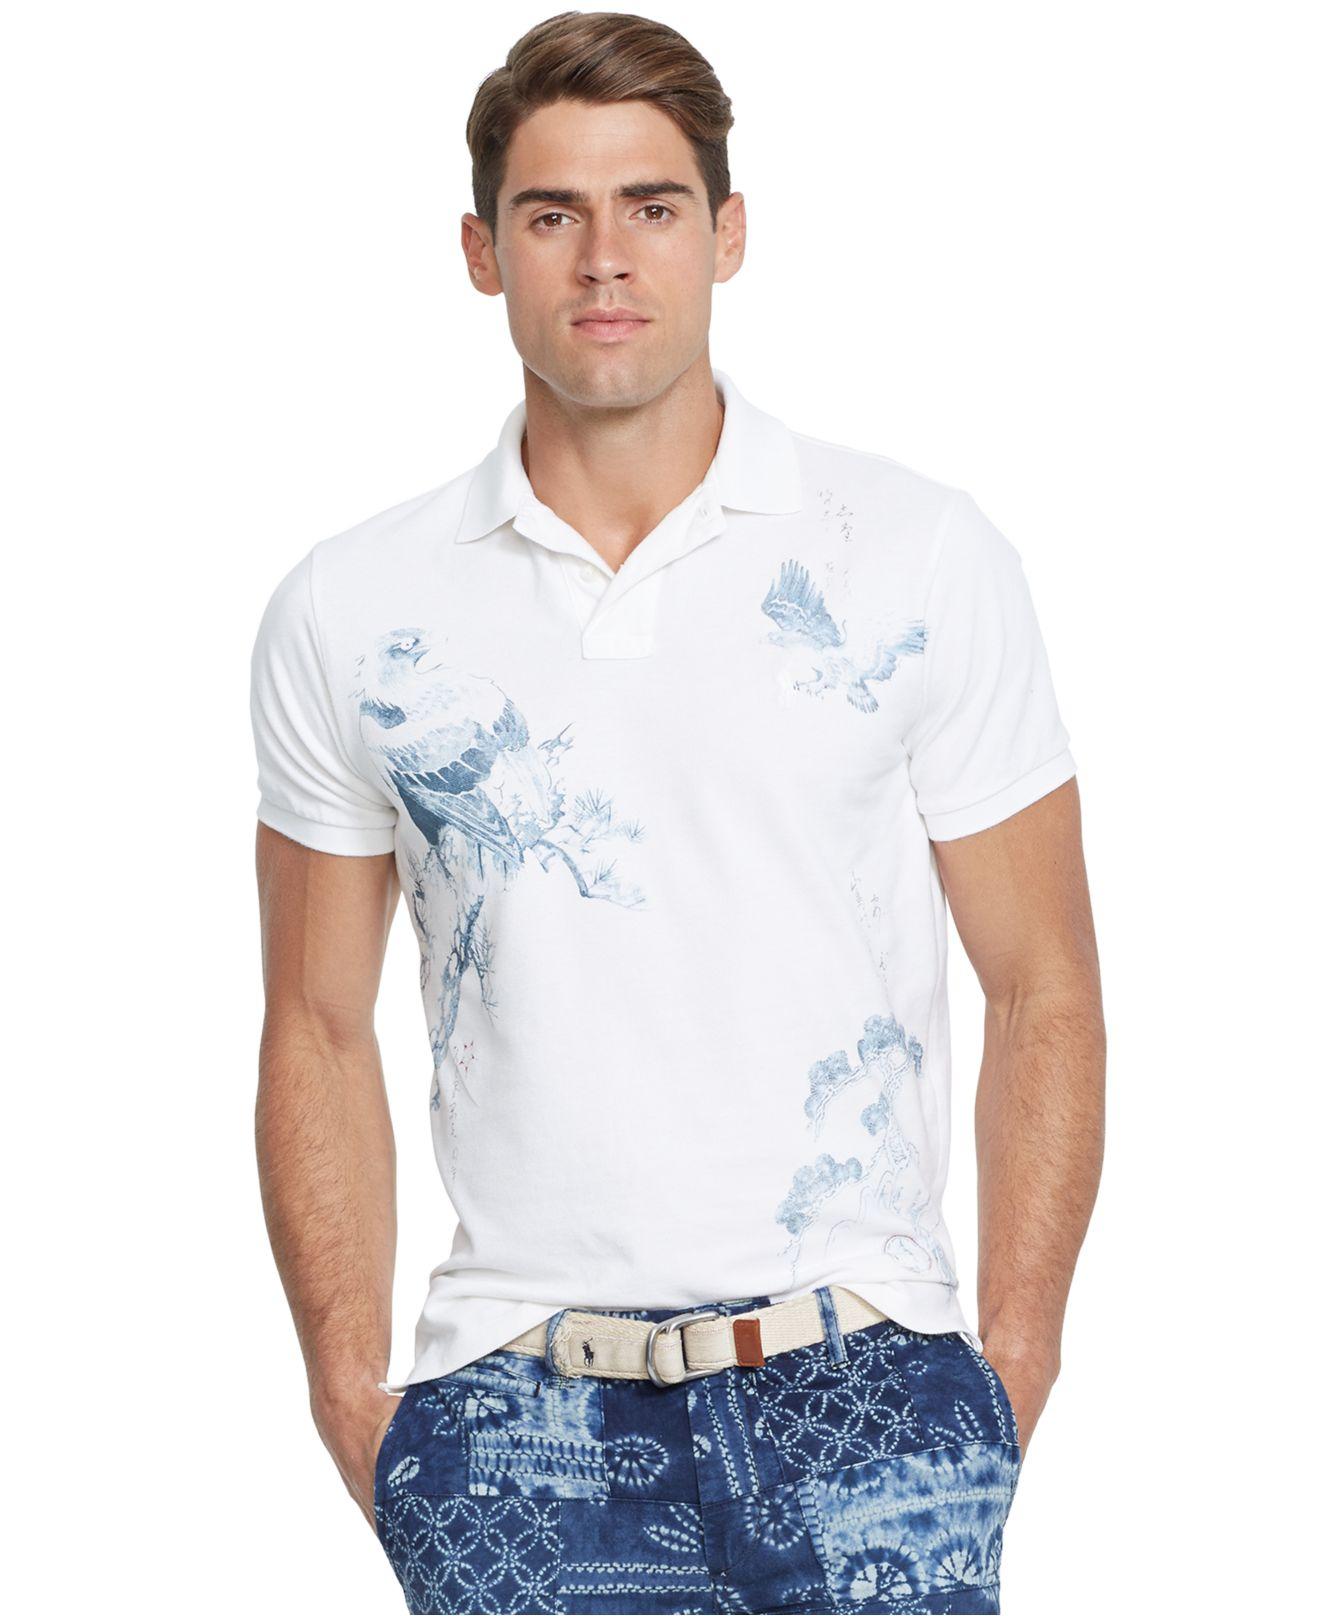 Polo ralph lauren custom fit printed polo shirt in white for Custom printed polo shirts cheap